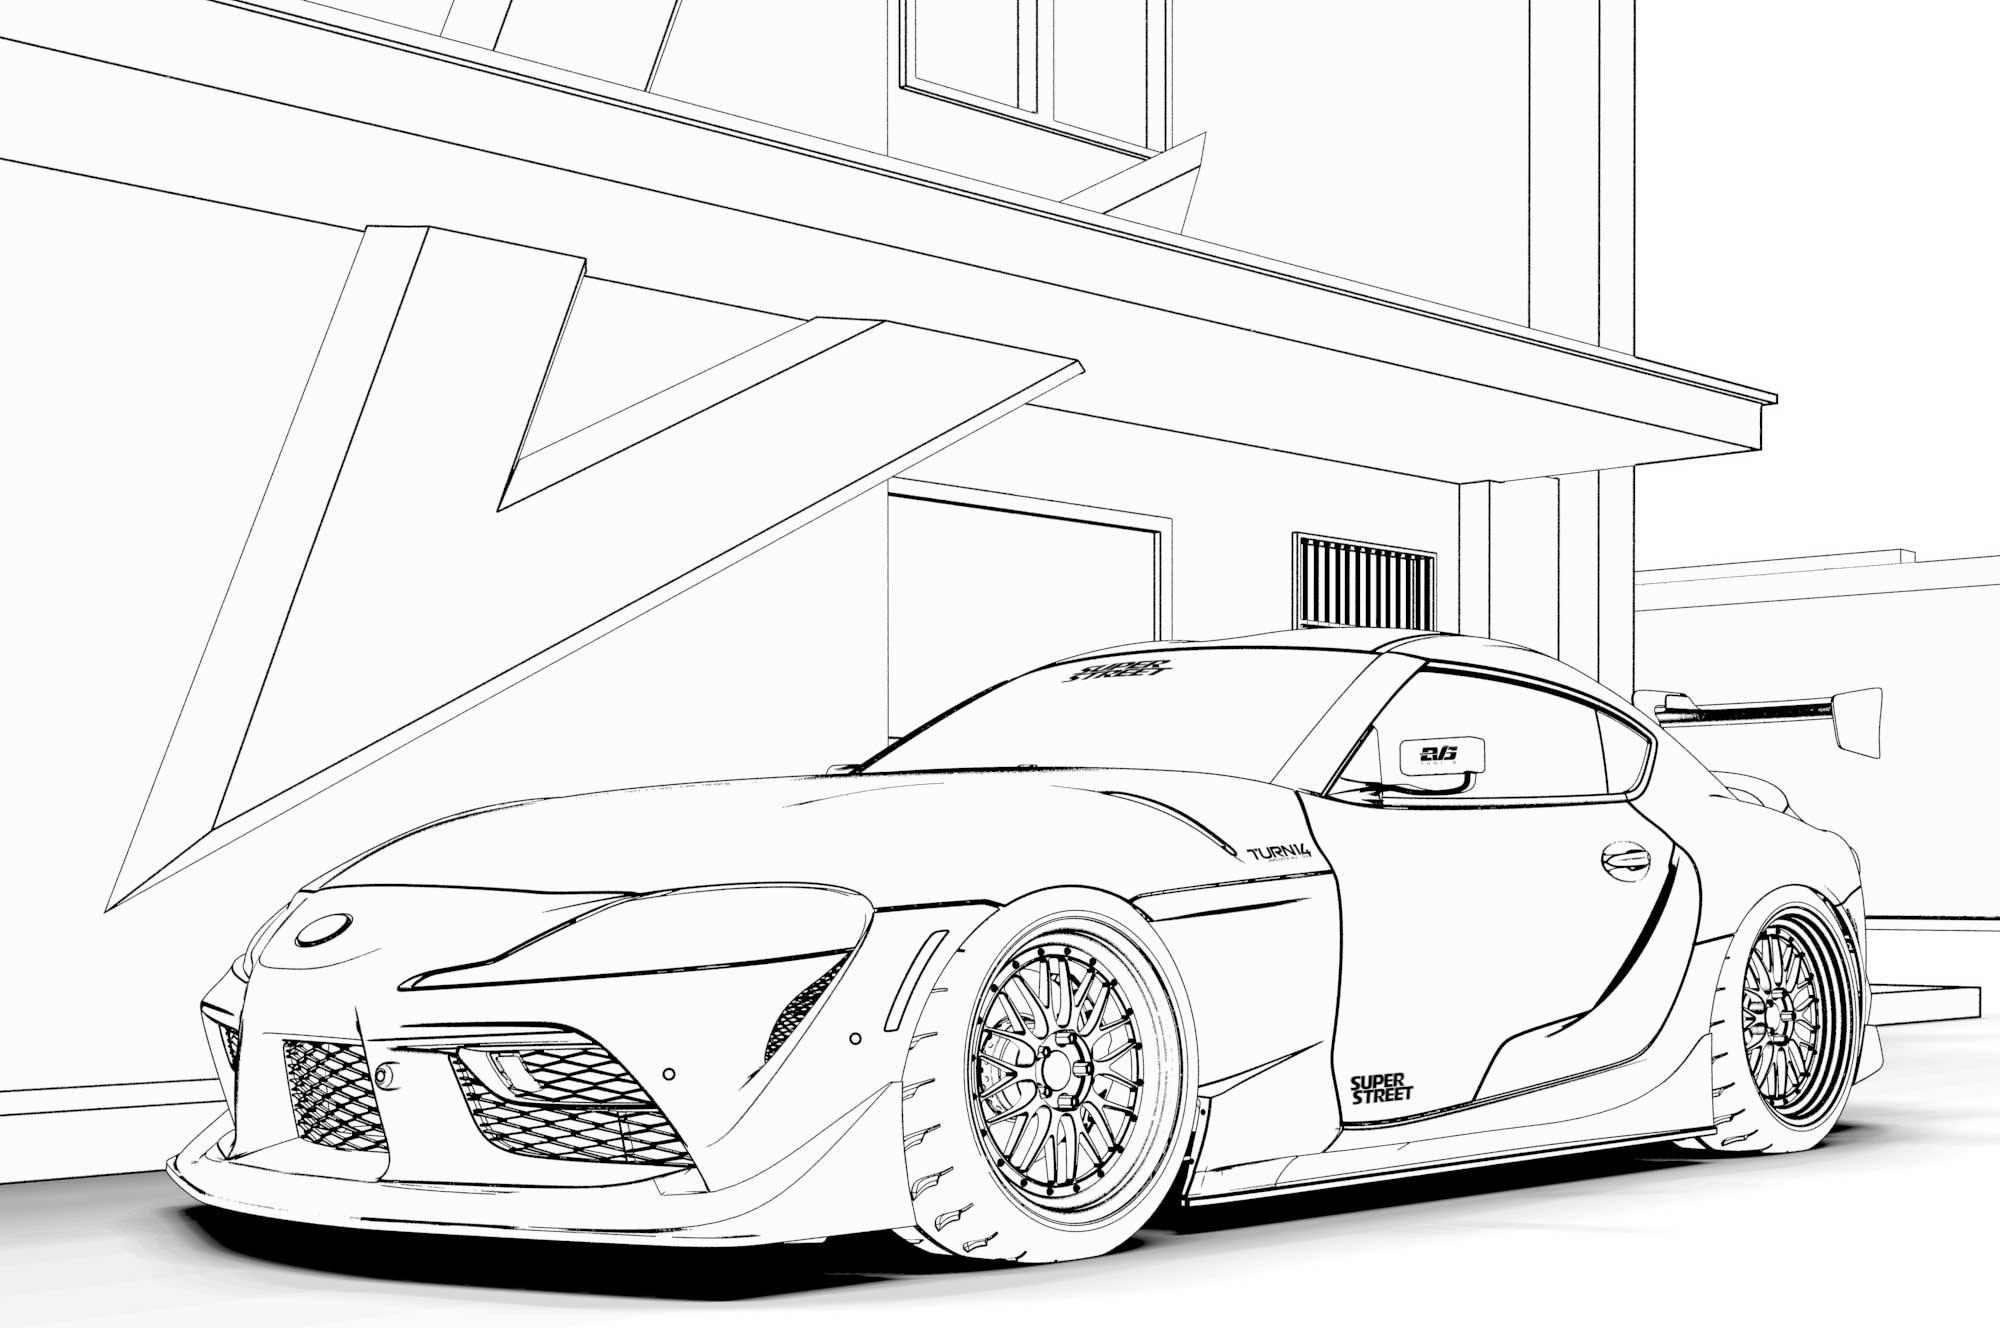 Car Coloring Pages Toyota Supra Ferrari F40 Nissan Gt R Mclaren 720s Lamborghini Huracan Free Downloads